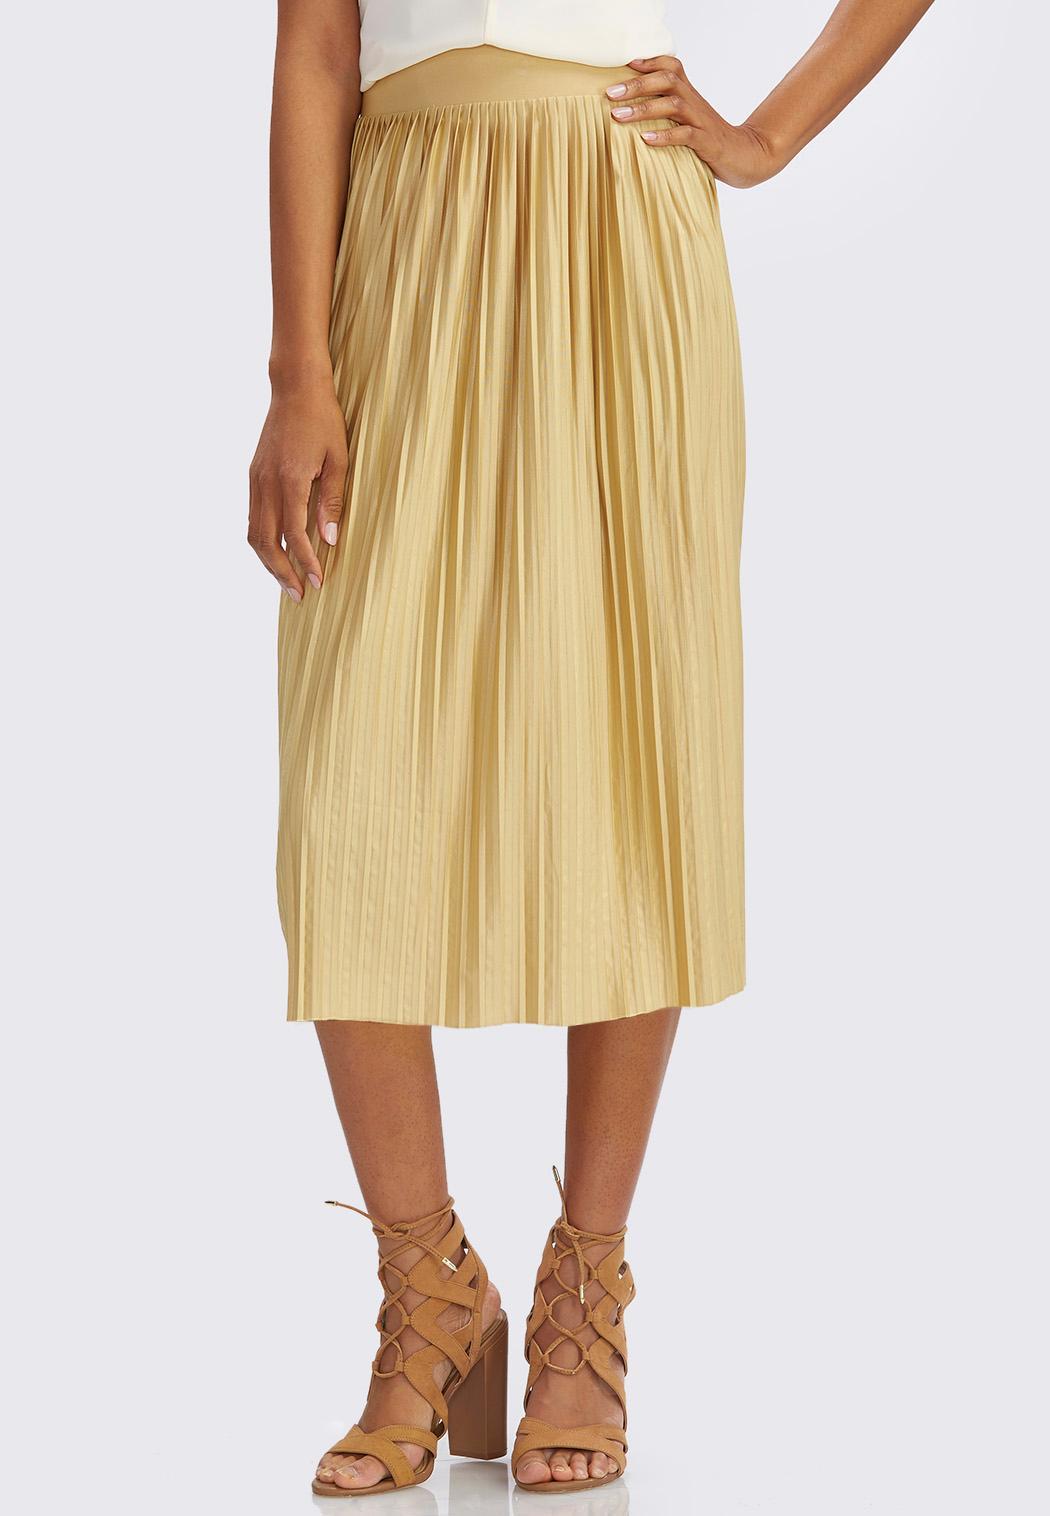 Plus Size Skirts | Cato Fashions